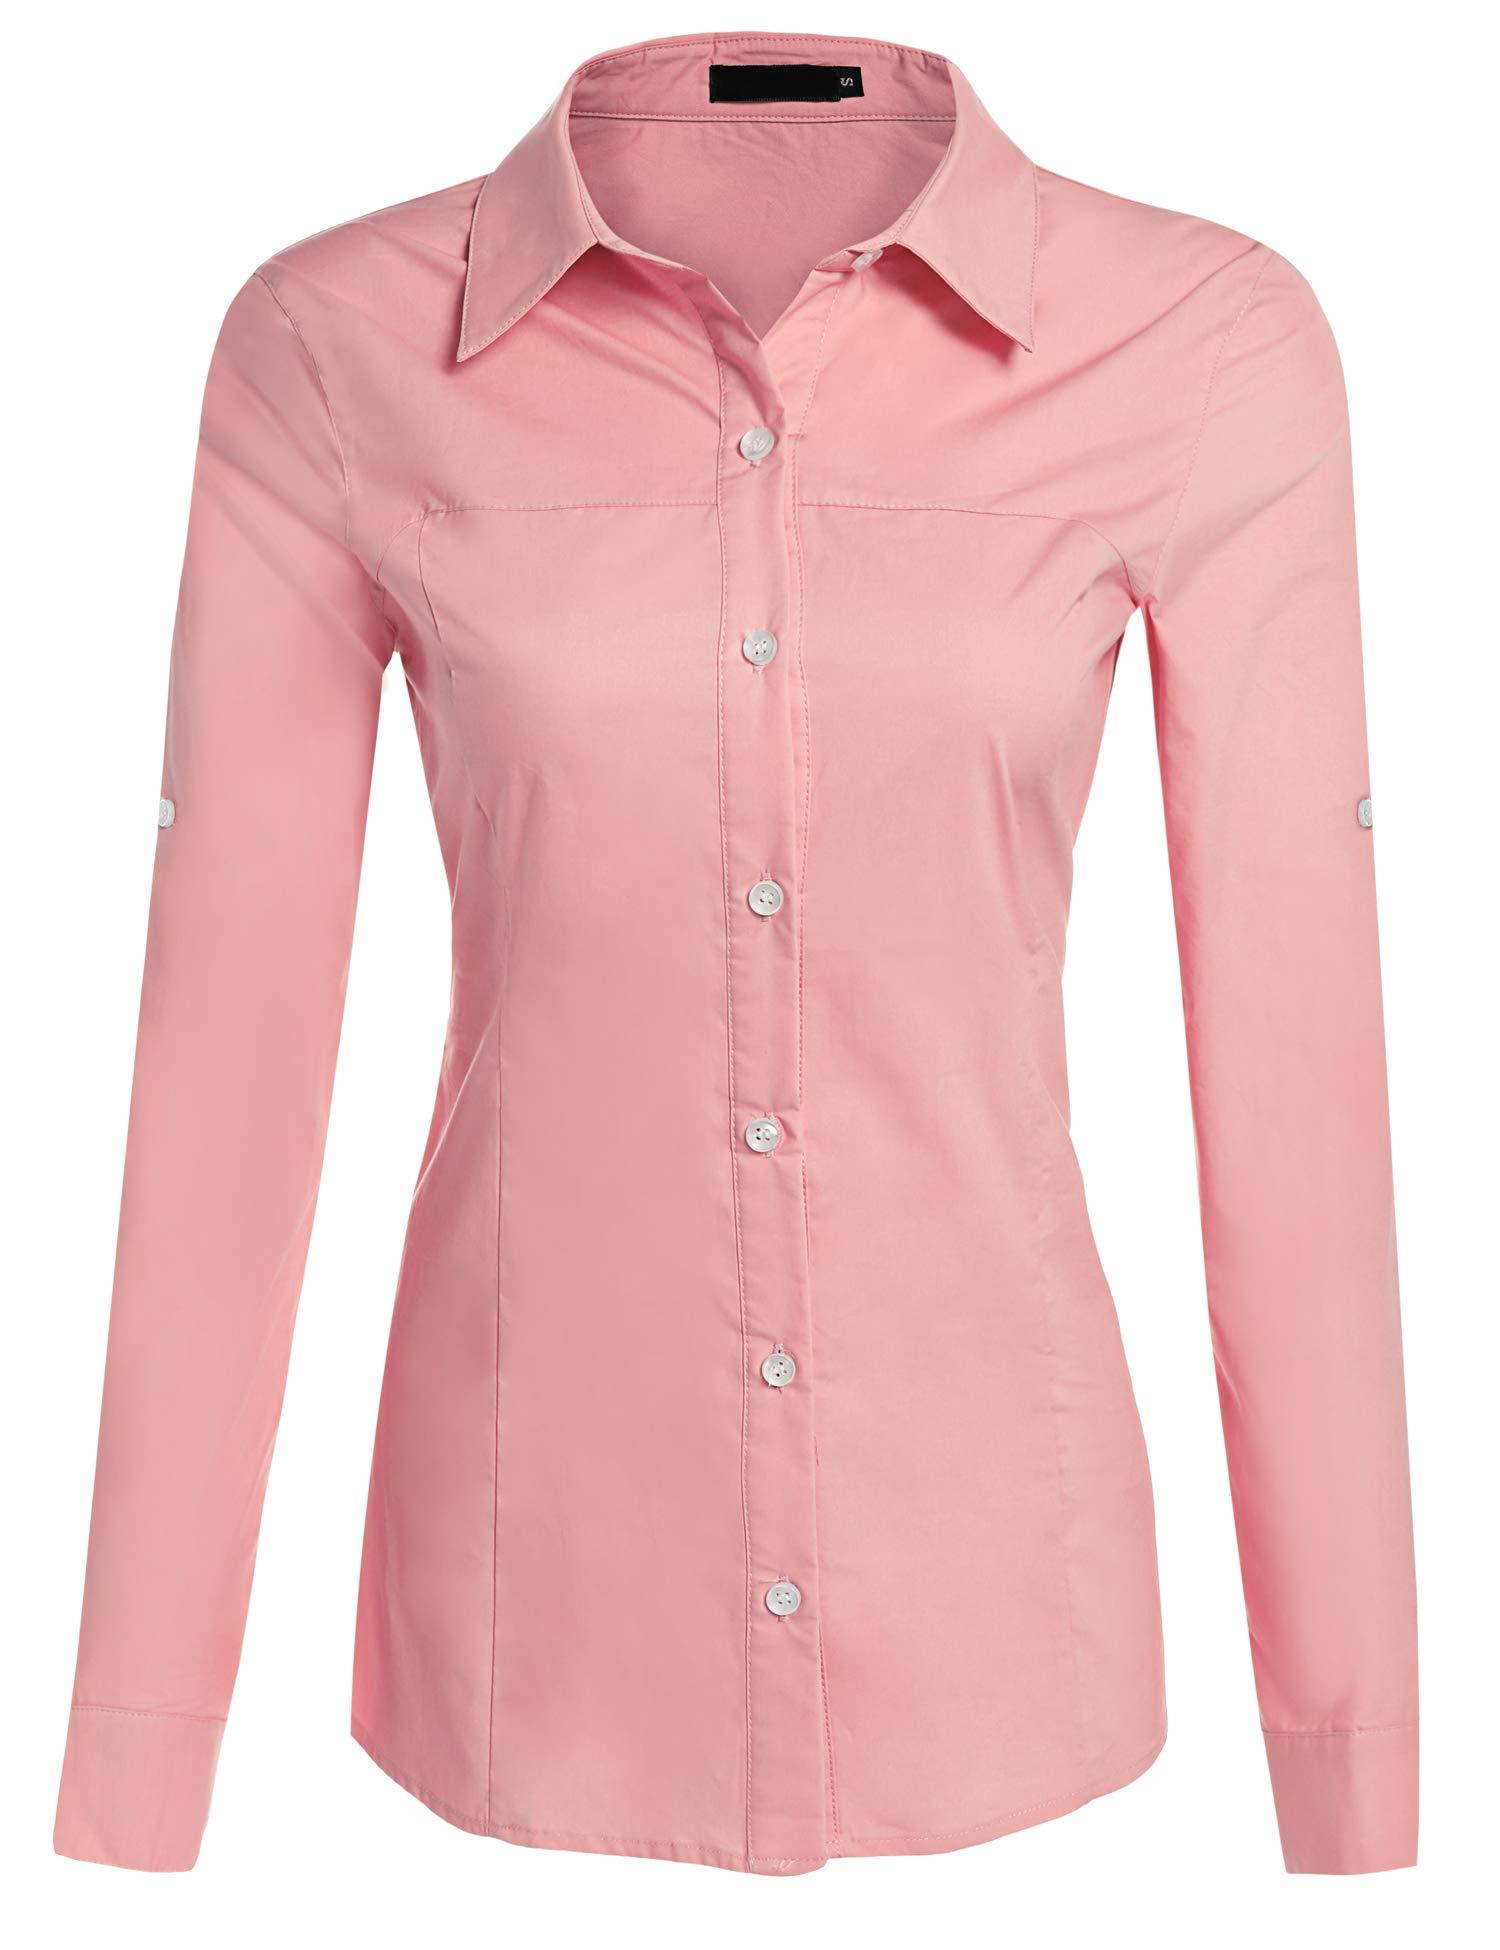 Hotouch Women's Basic Blouse Shirt Roll Up Long Sleeve Solid Cotton Shirt (Pink XL)